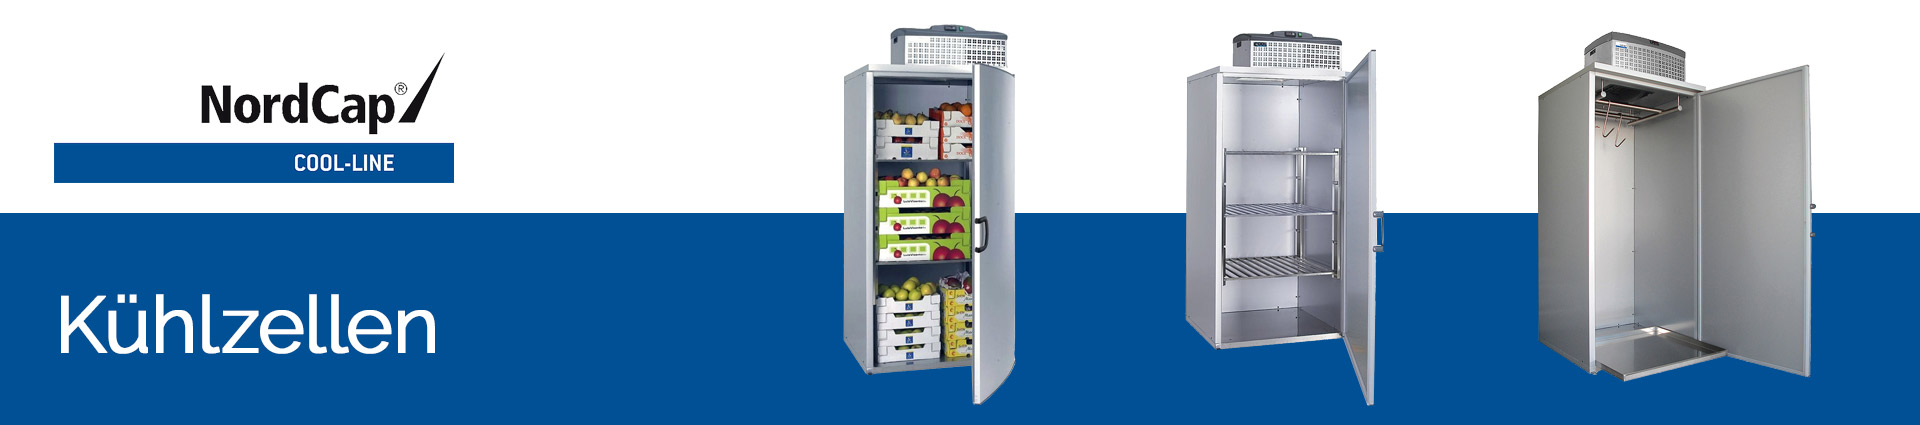 NordCap Cool-Line Kühlzellen Banner